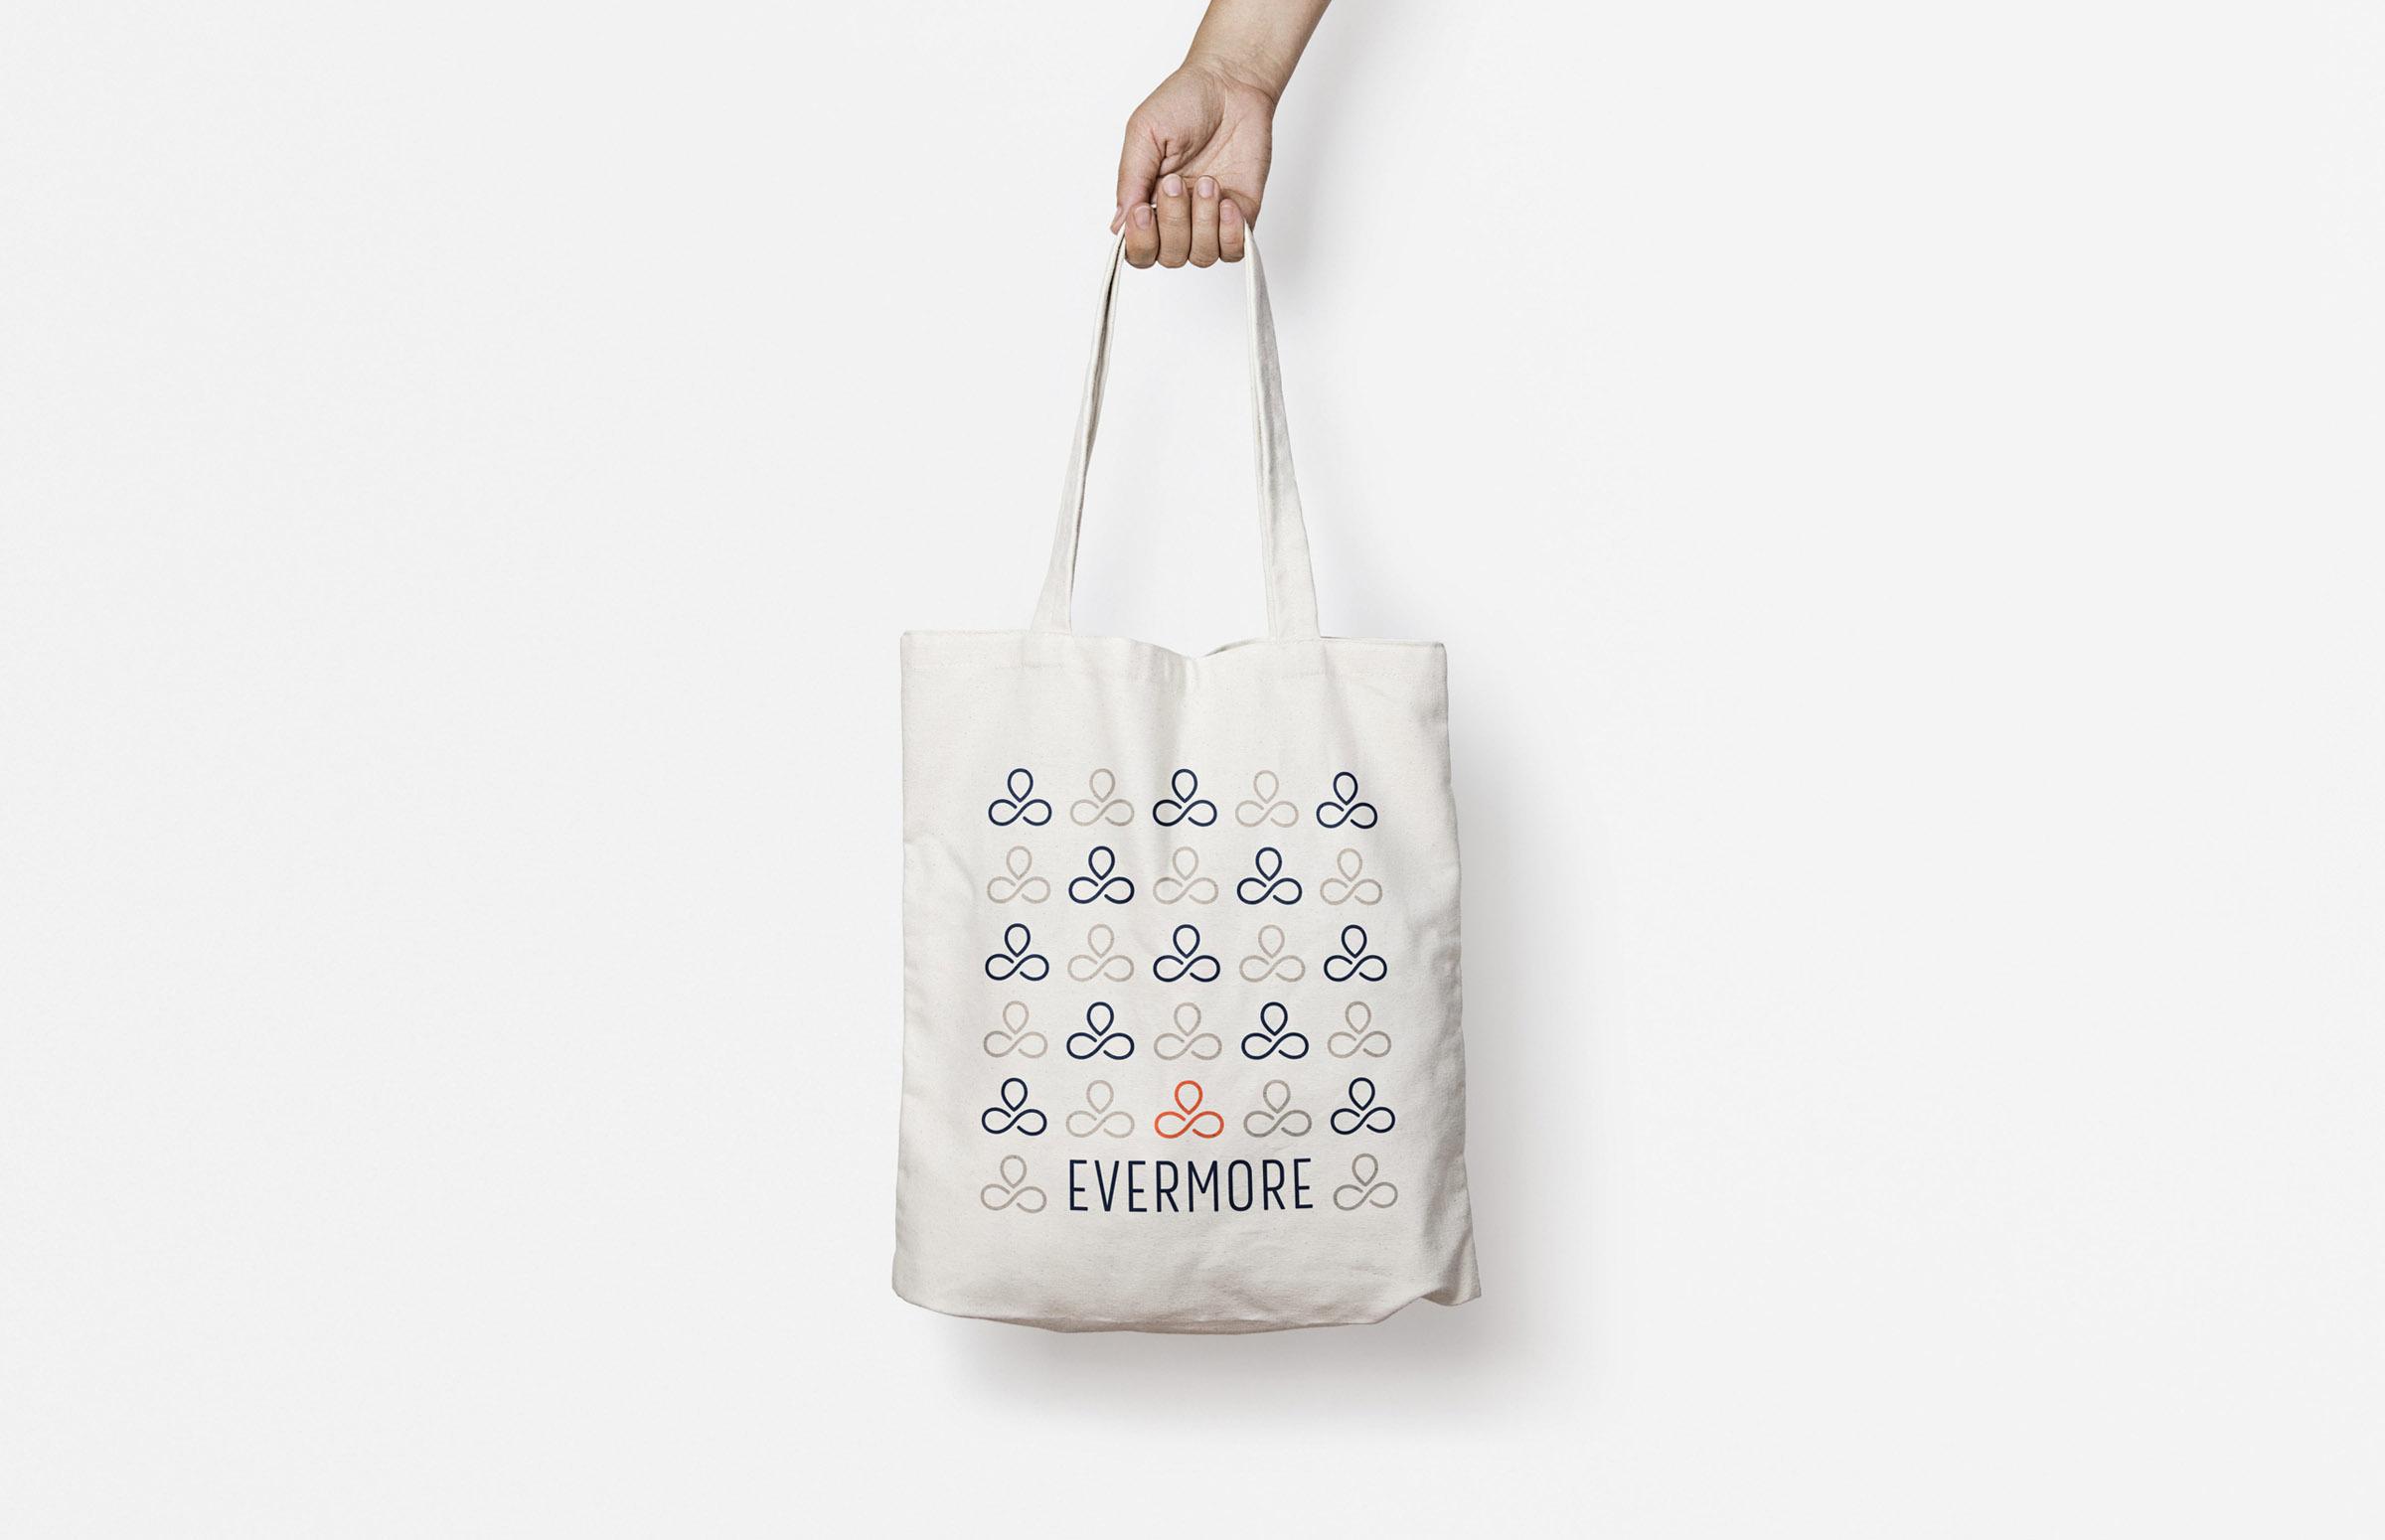 Evermore Cannabis Collective: Tote Bag Design